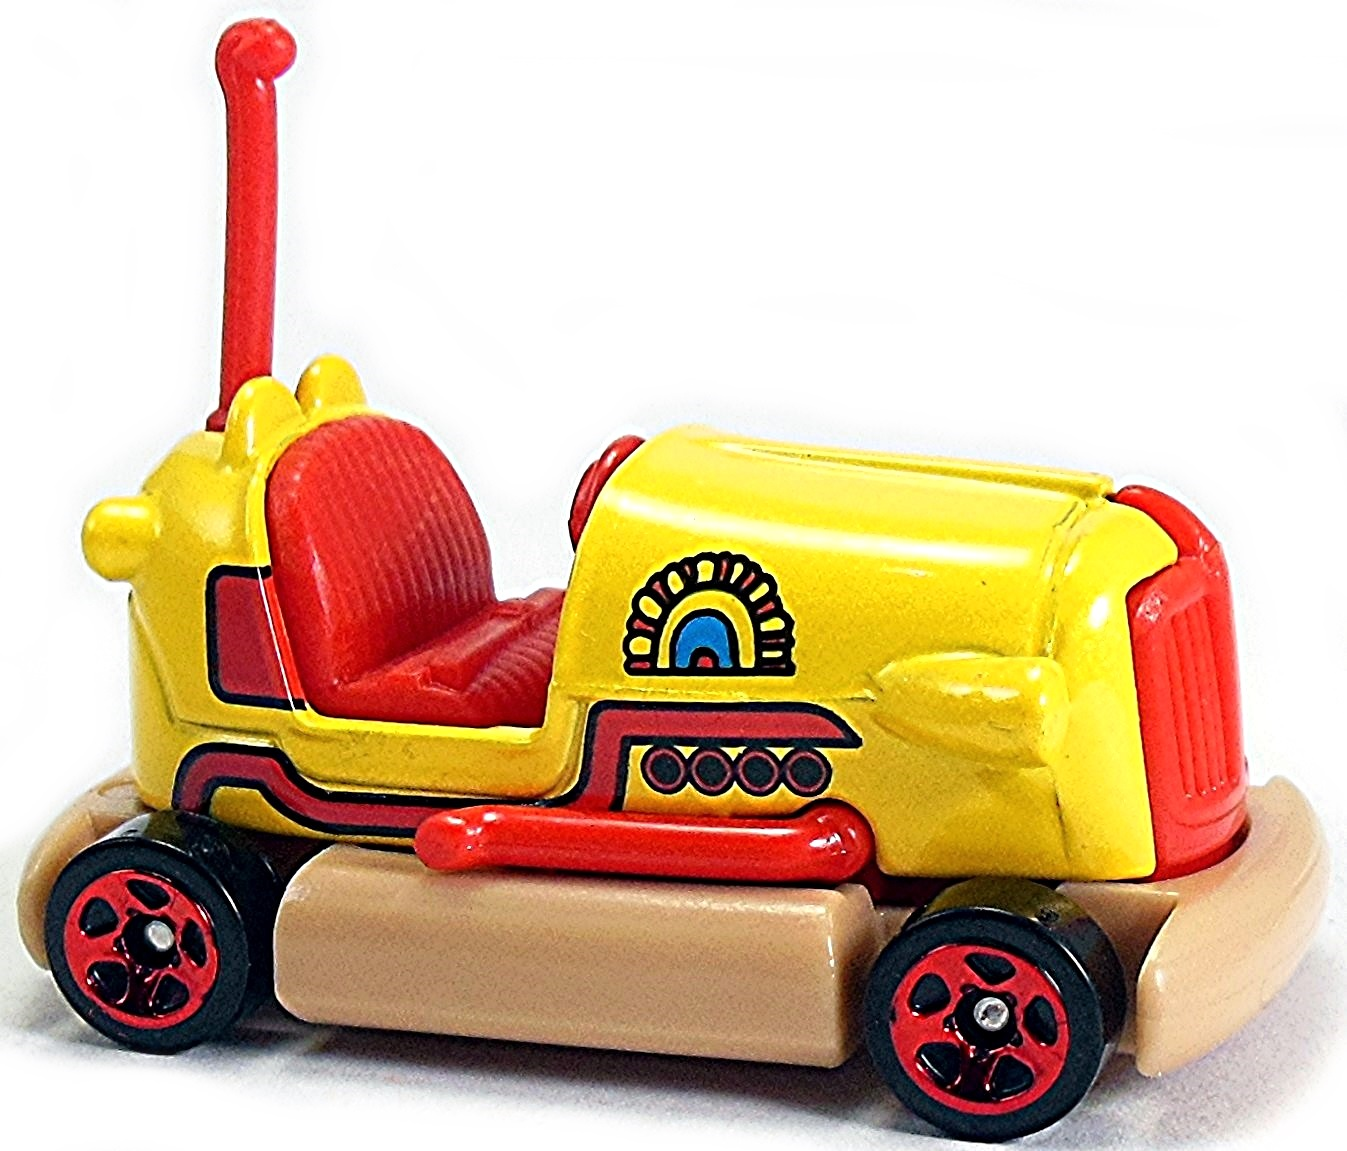 2016 The Beatles Yellow Submarine Hot Wheels Newsletter